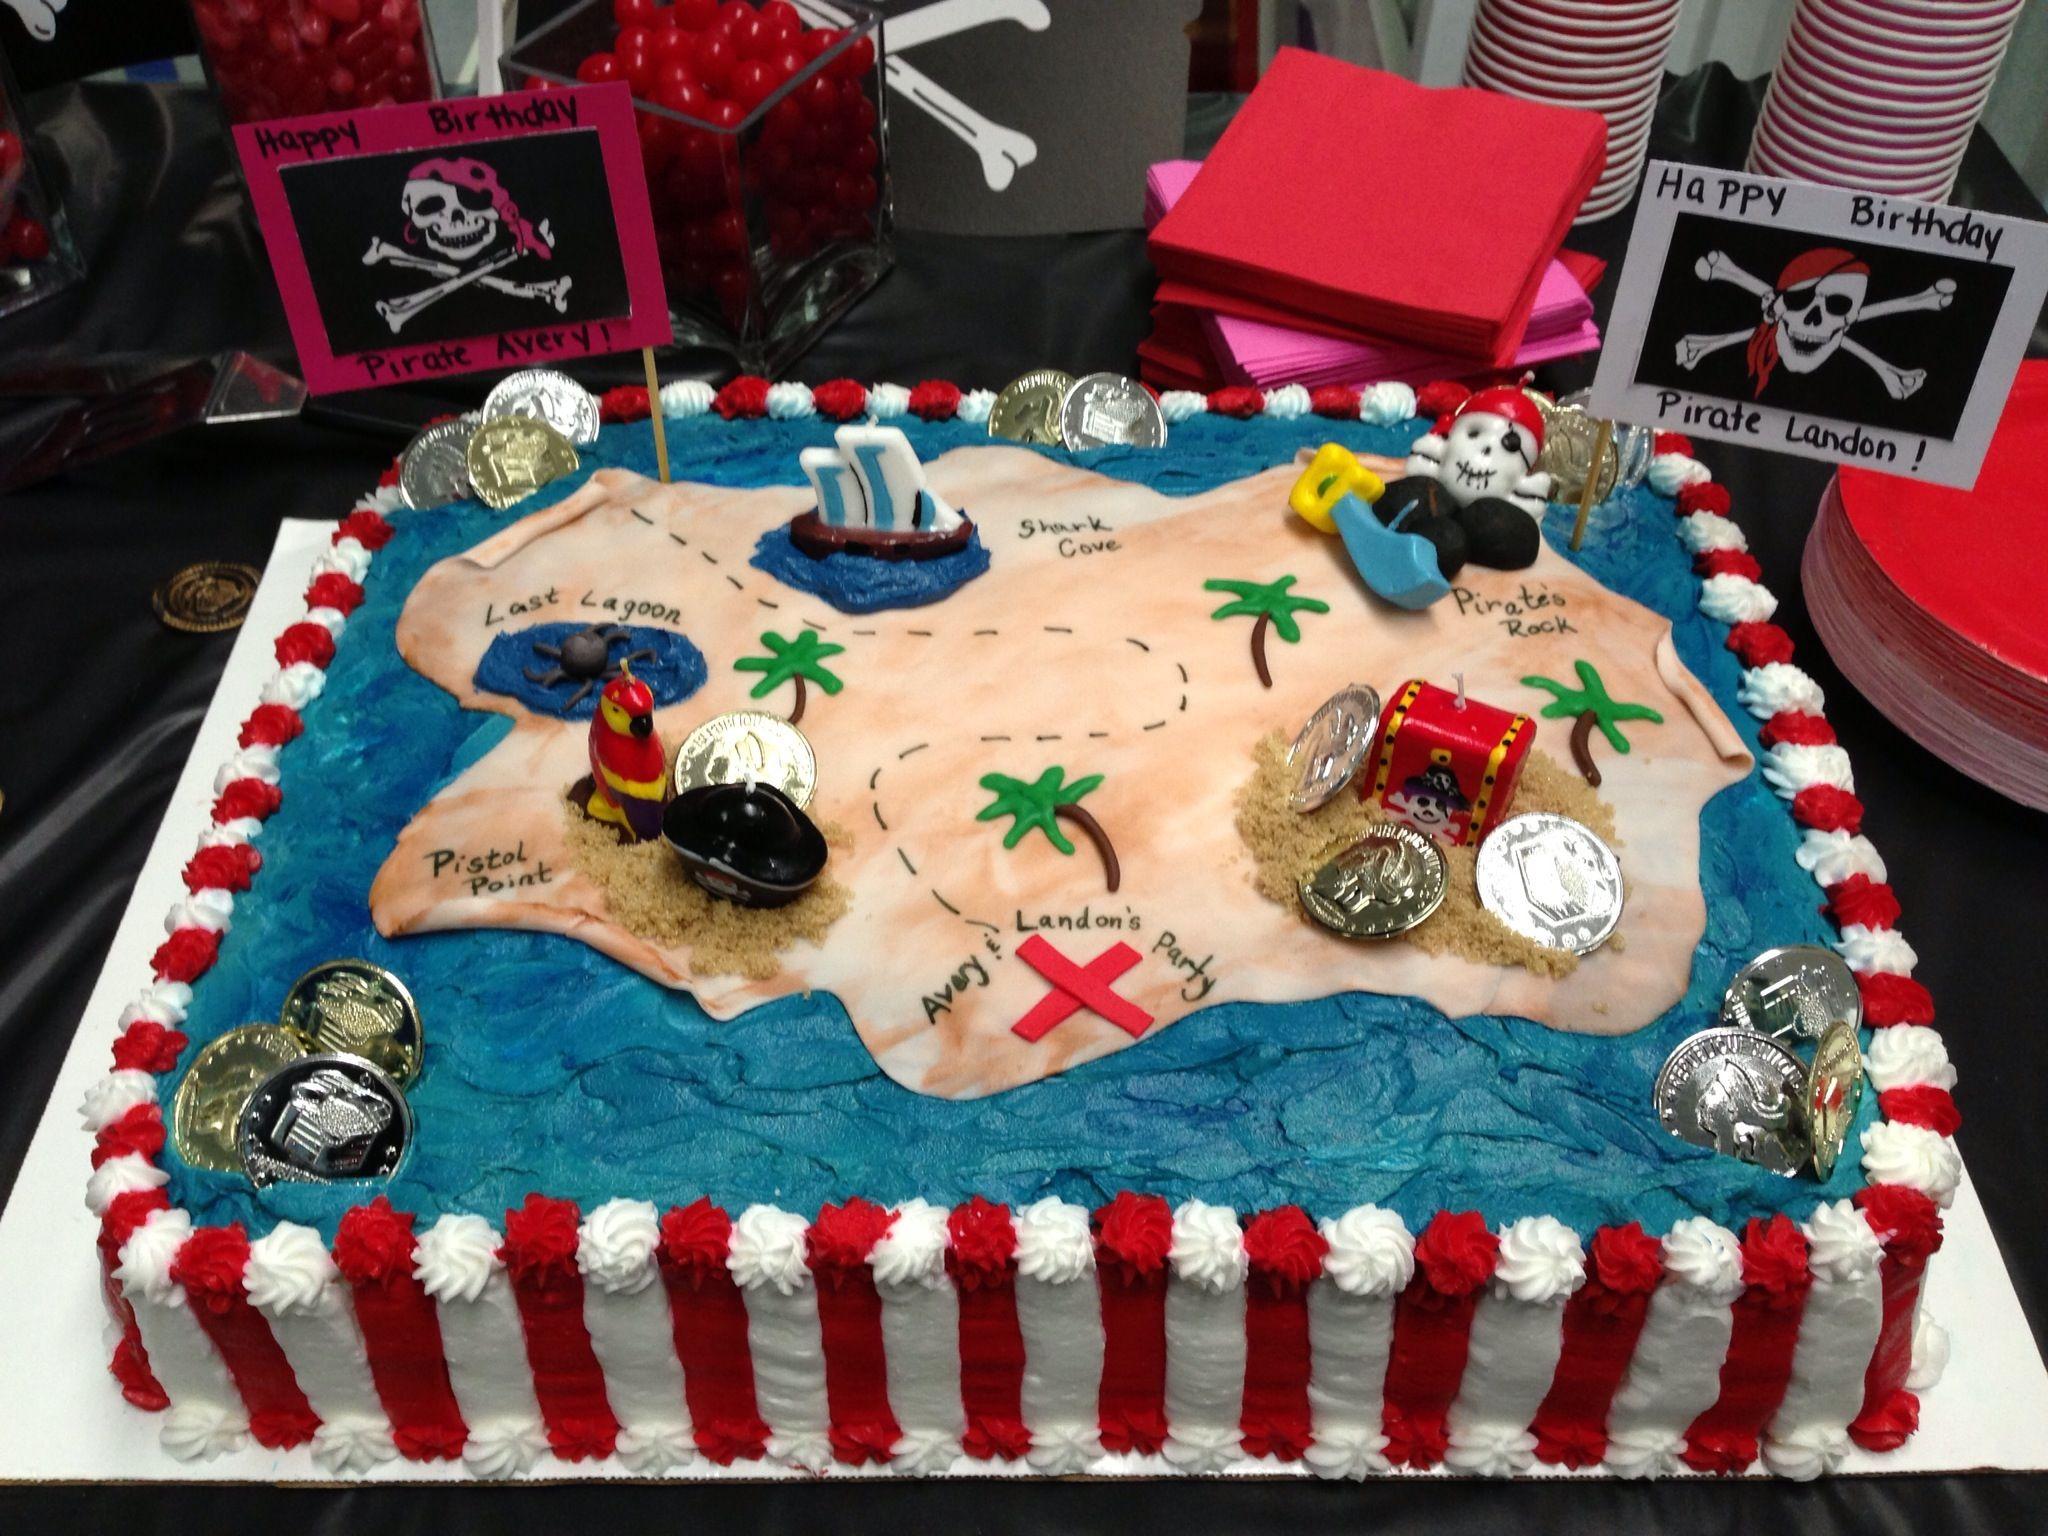 Easy To Make Pirate Cake